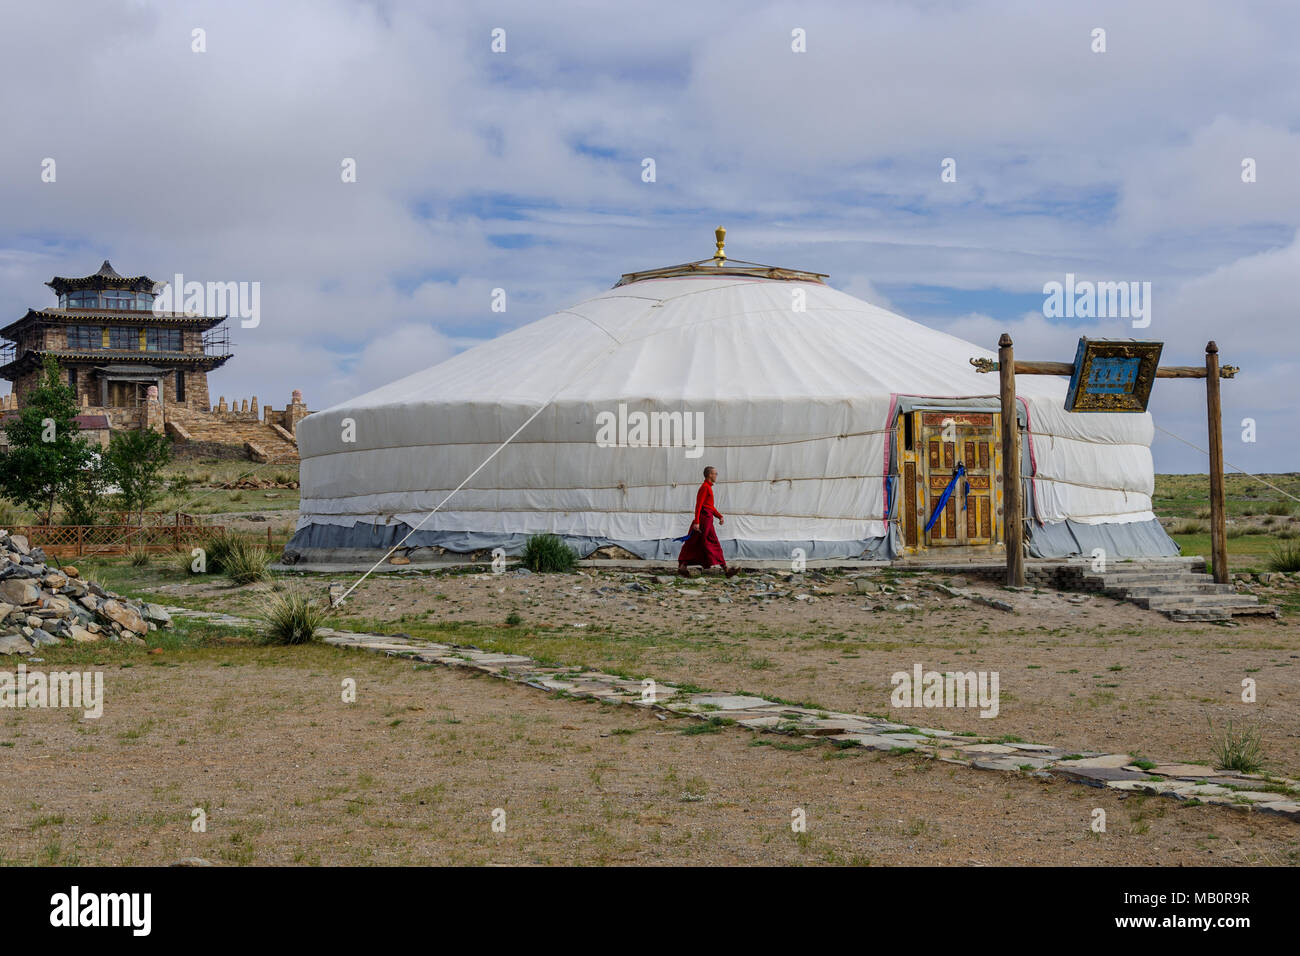 Buddhist complex in the Gobi Desert, Mongolia - Stock Image